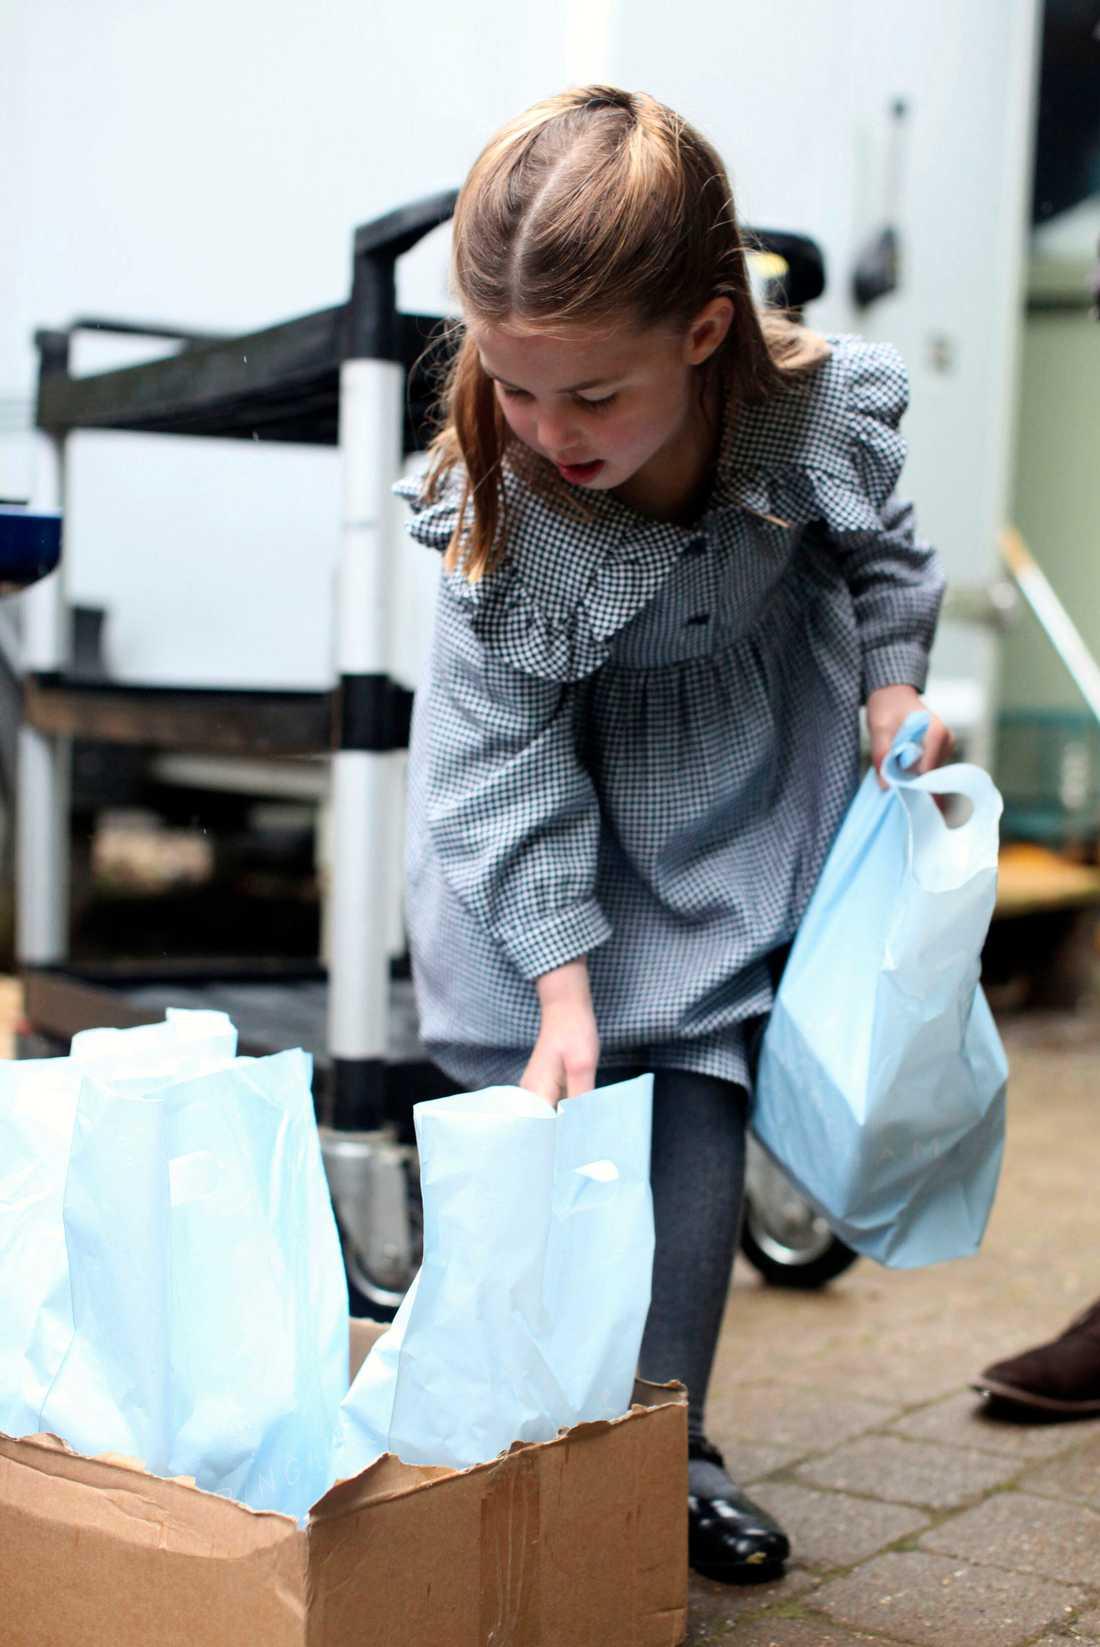 På lördagen fyllde prinsessan Charlotte fem år.